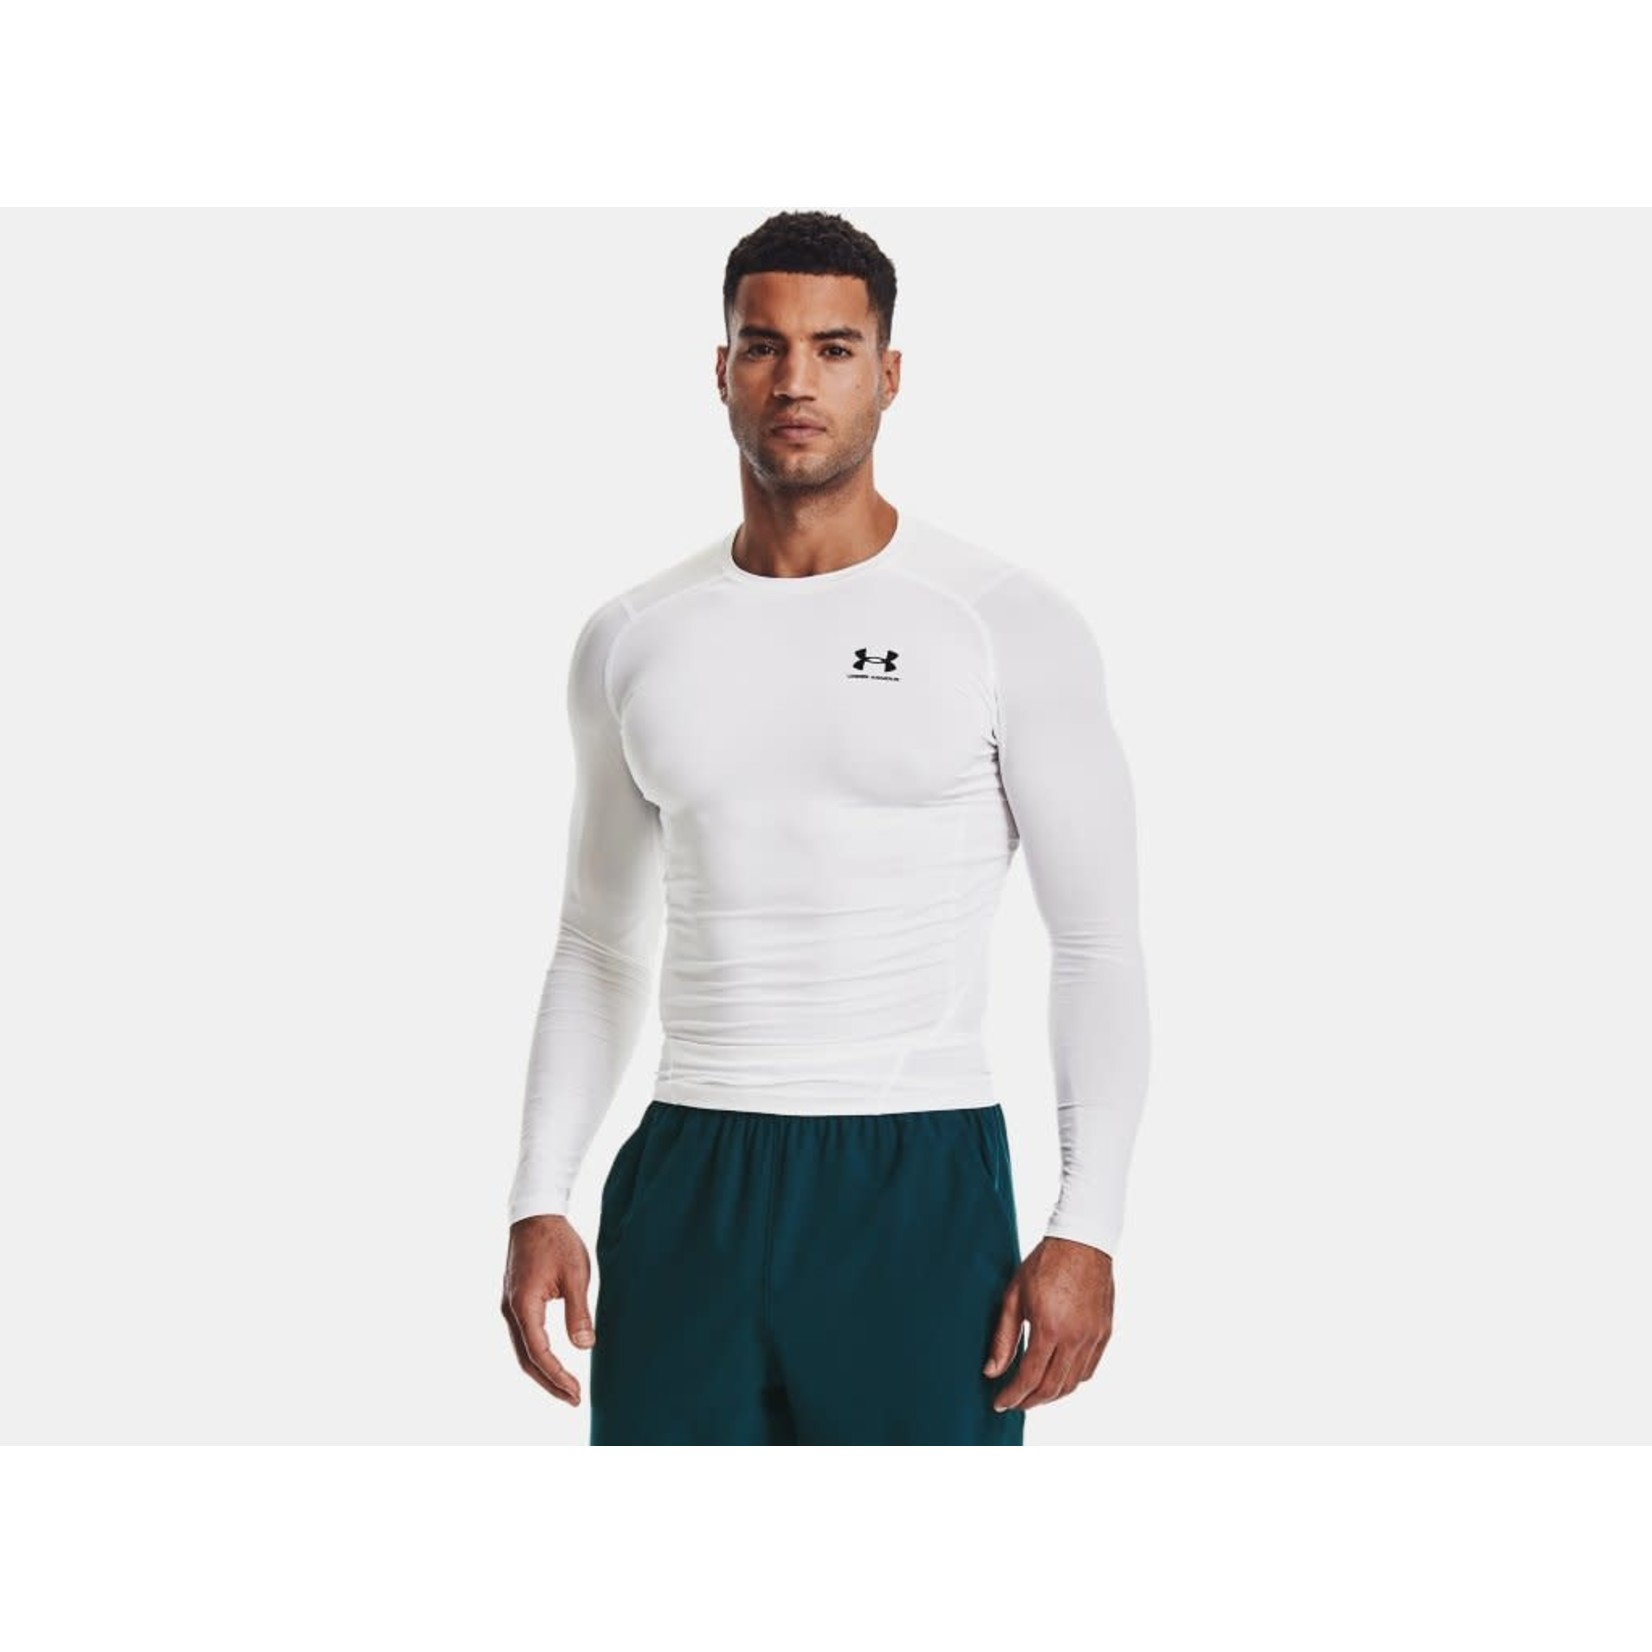 Under Armour Under Armour Compression Shirt, HG Armour LS, Mens